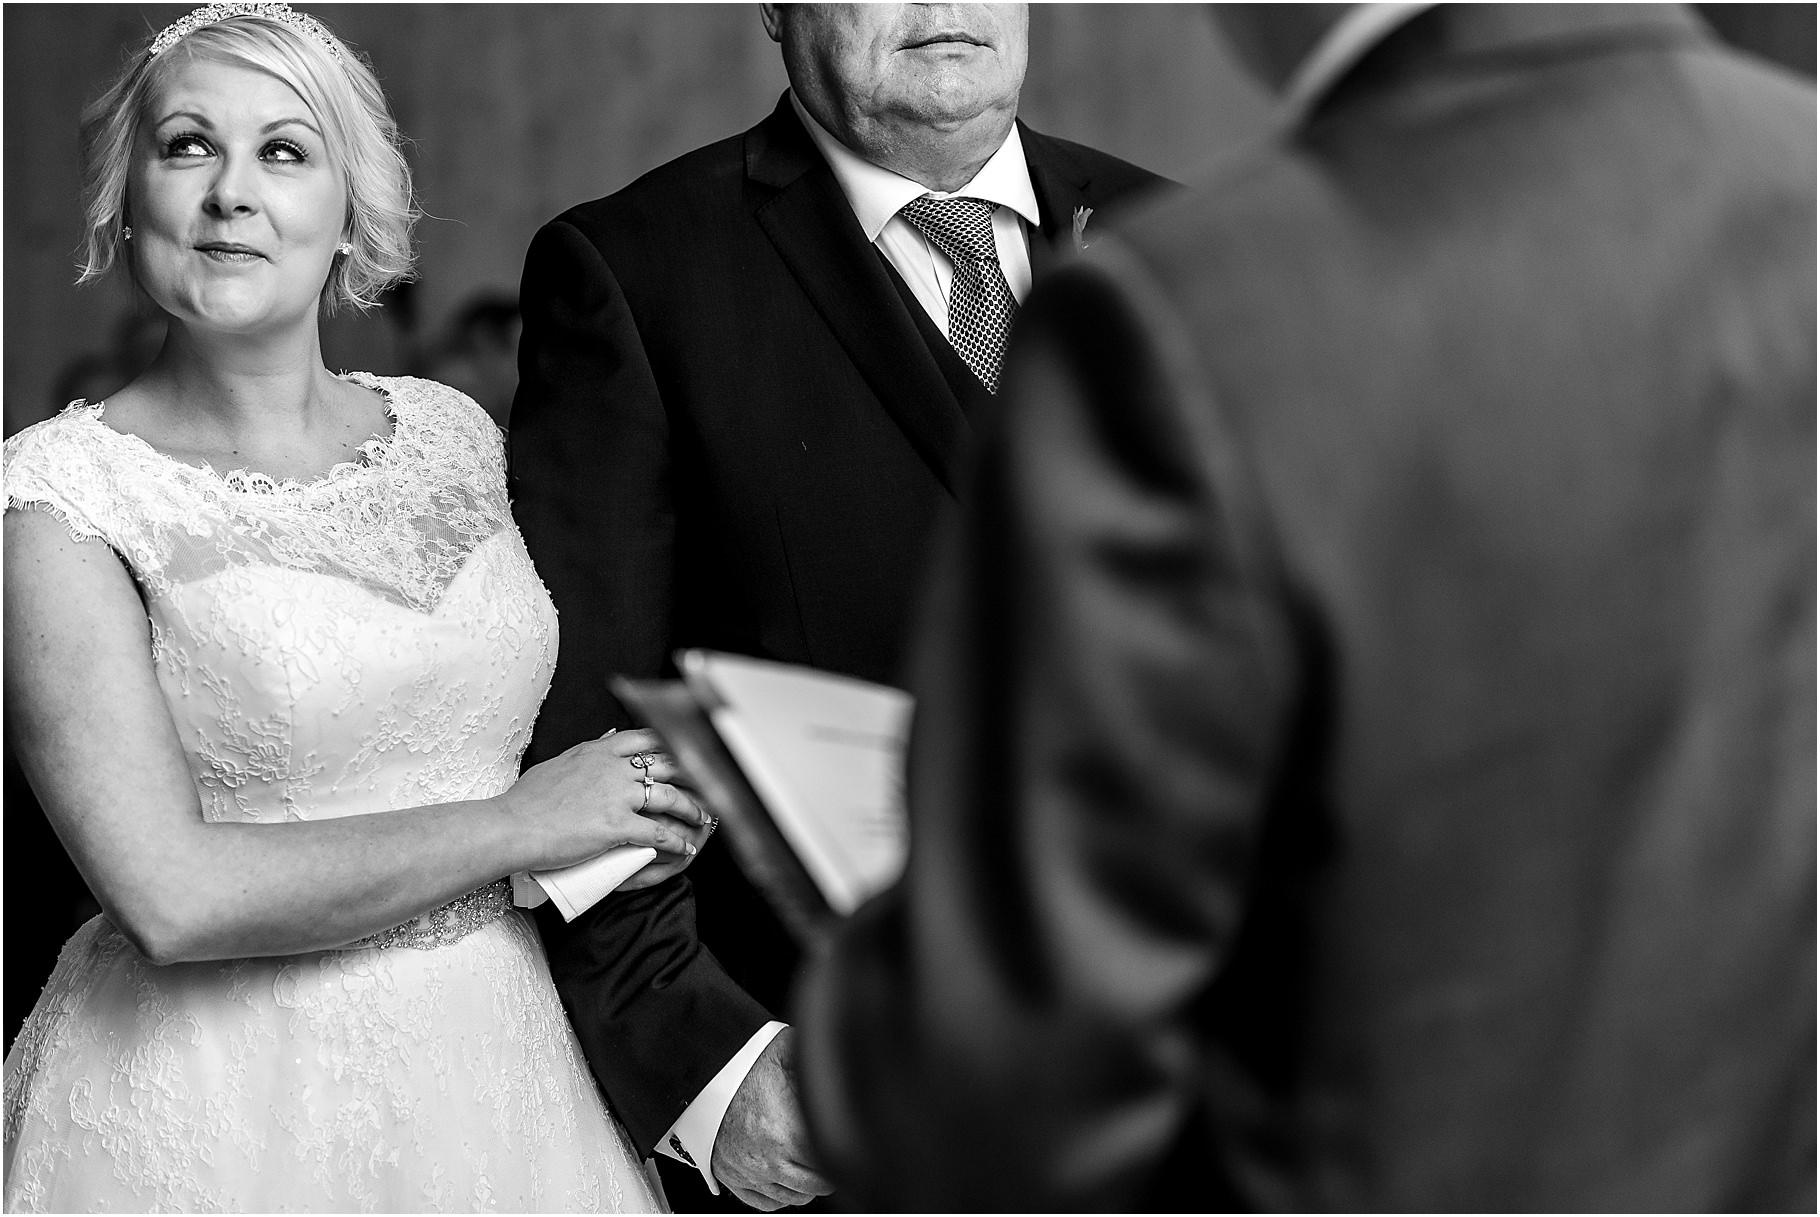 dan-wootton-photography-2017-weddings-191.jpg